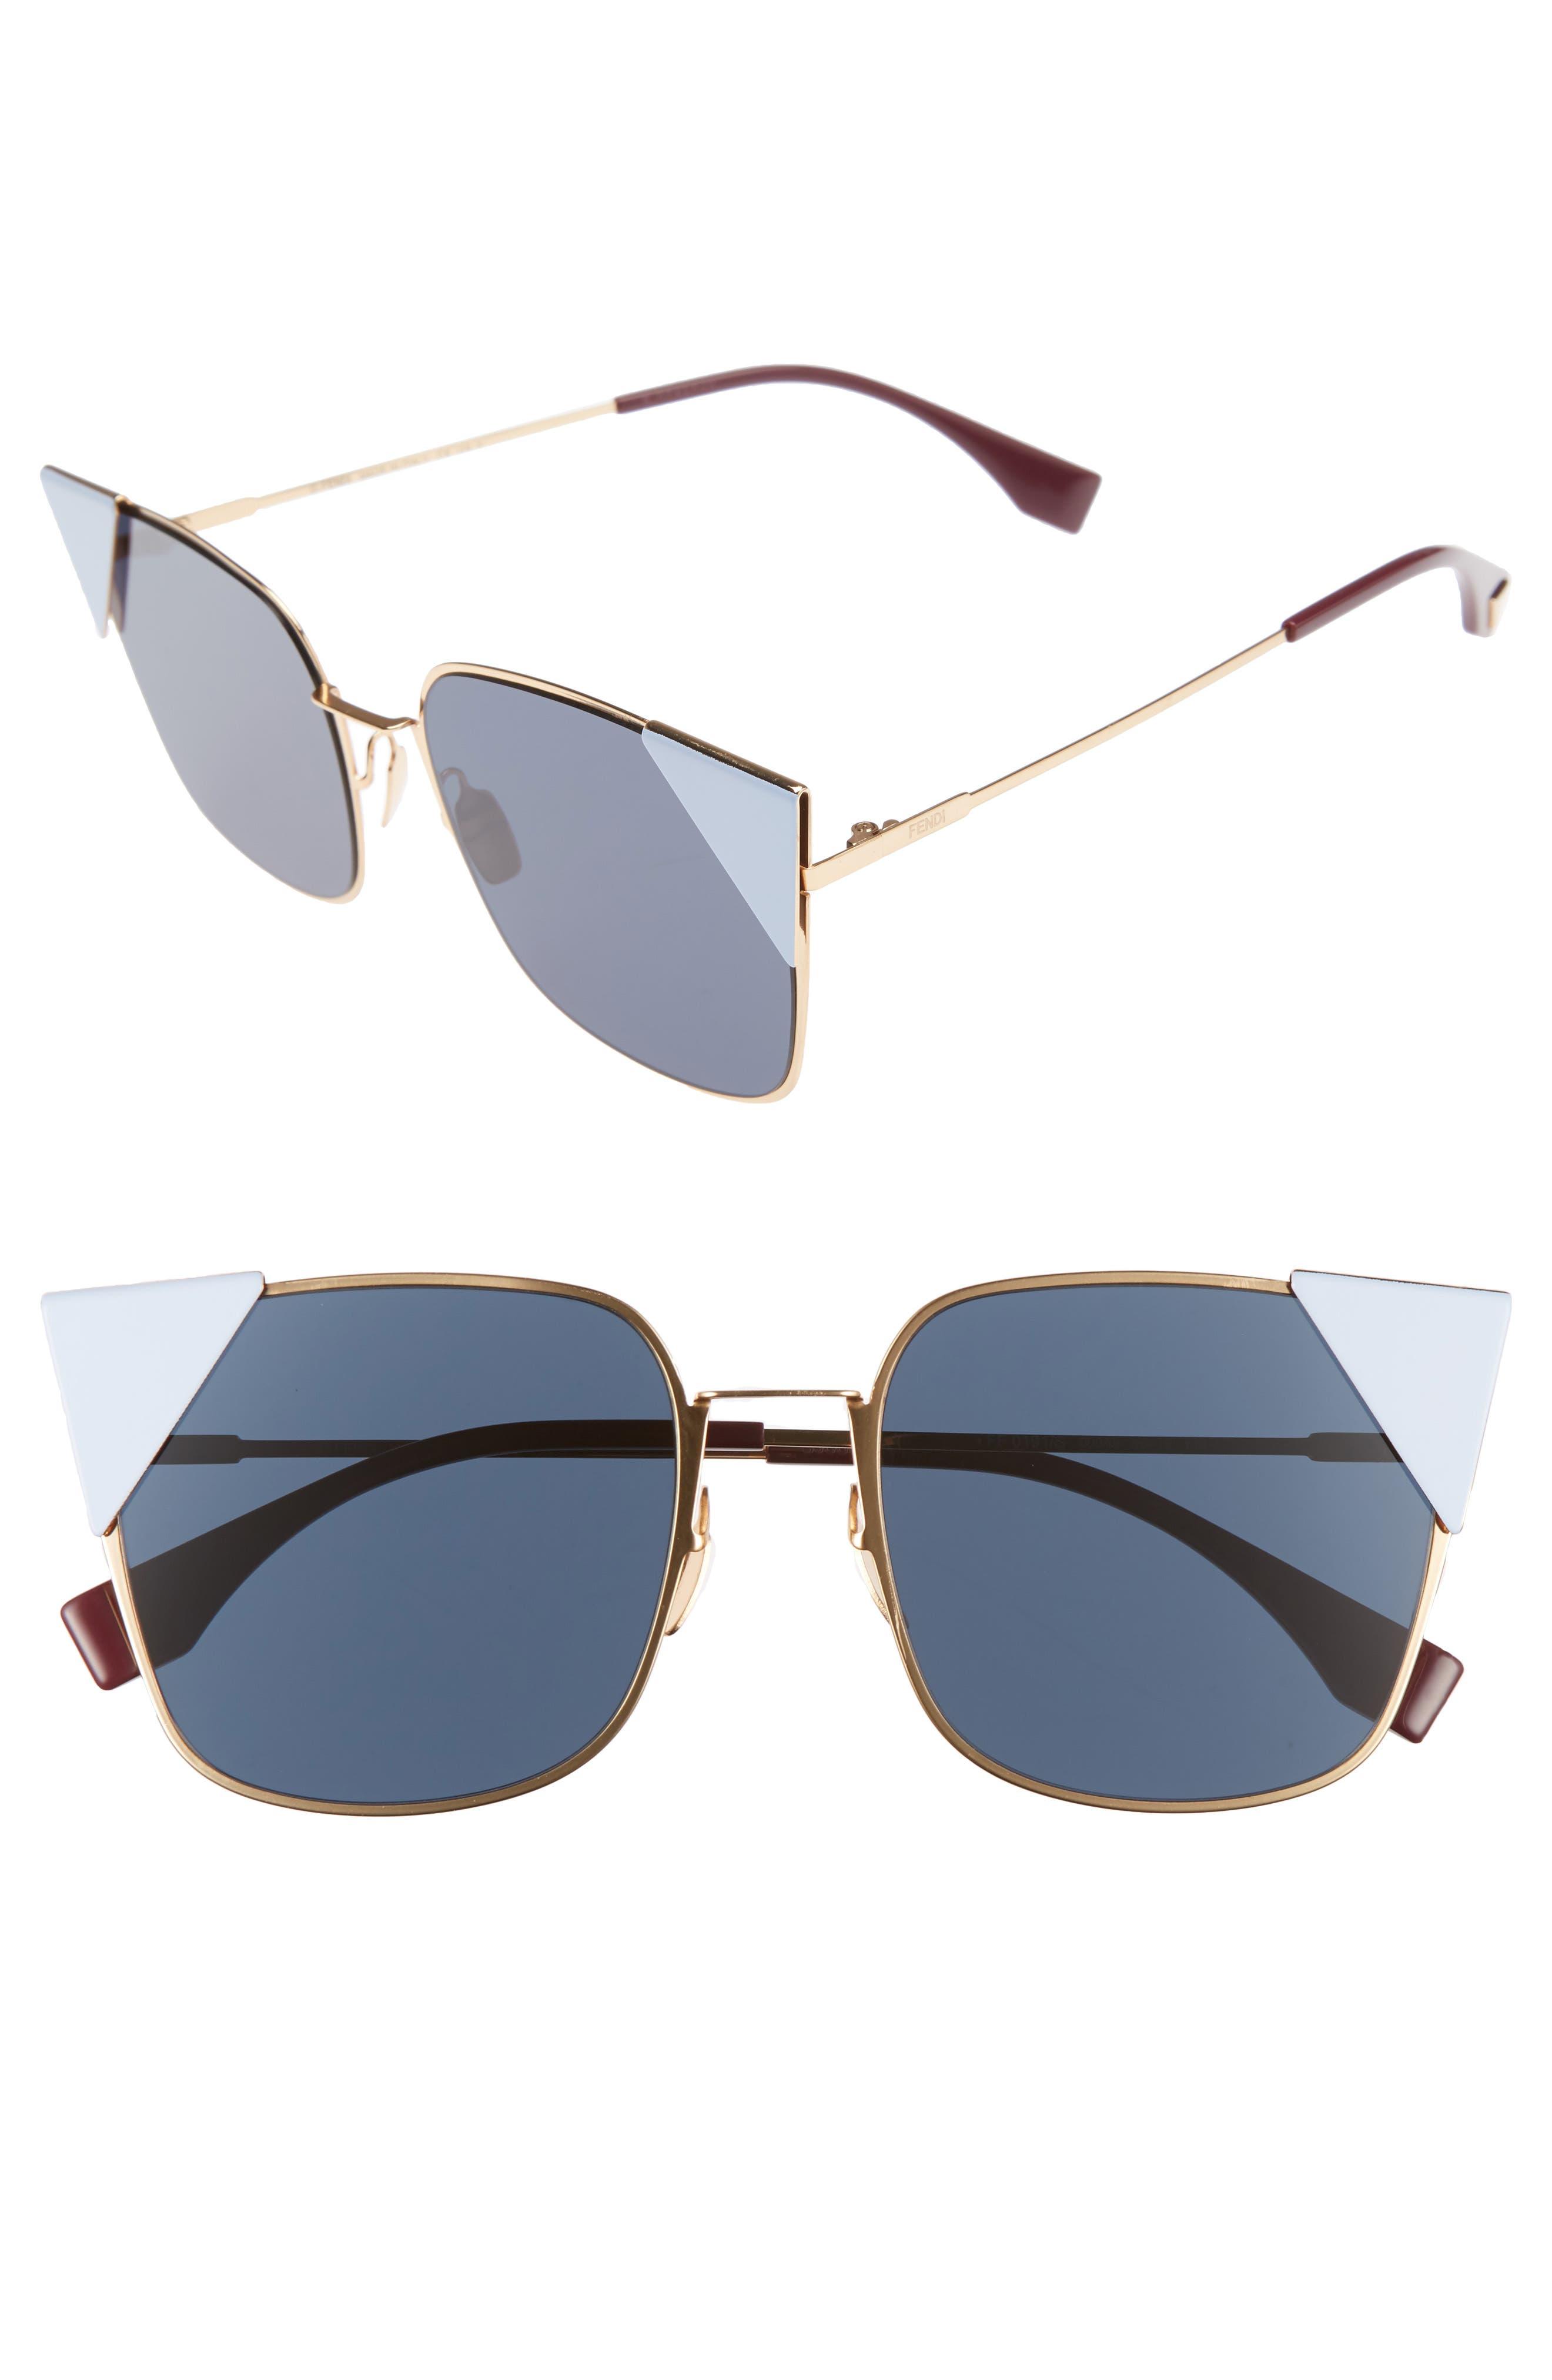 55mm Tipped Cat Eye Sunglasses,                             Alternate thumbnail 3, color,                             ROSE METALLIC GOLD